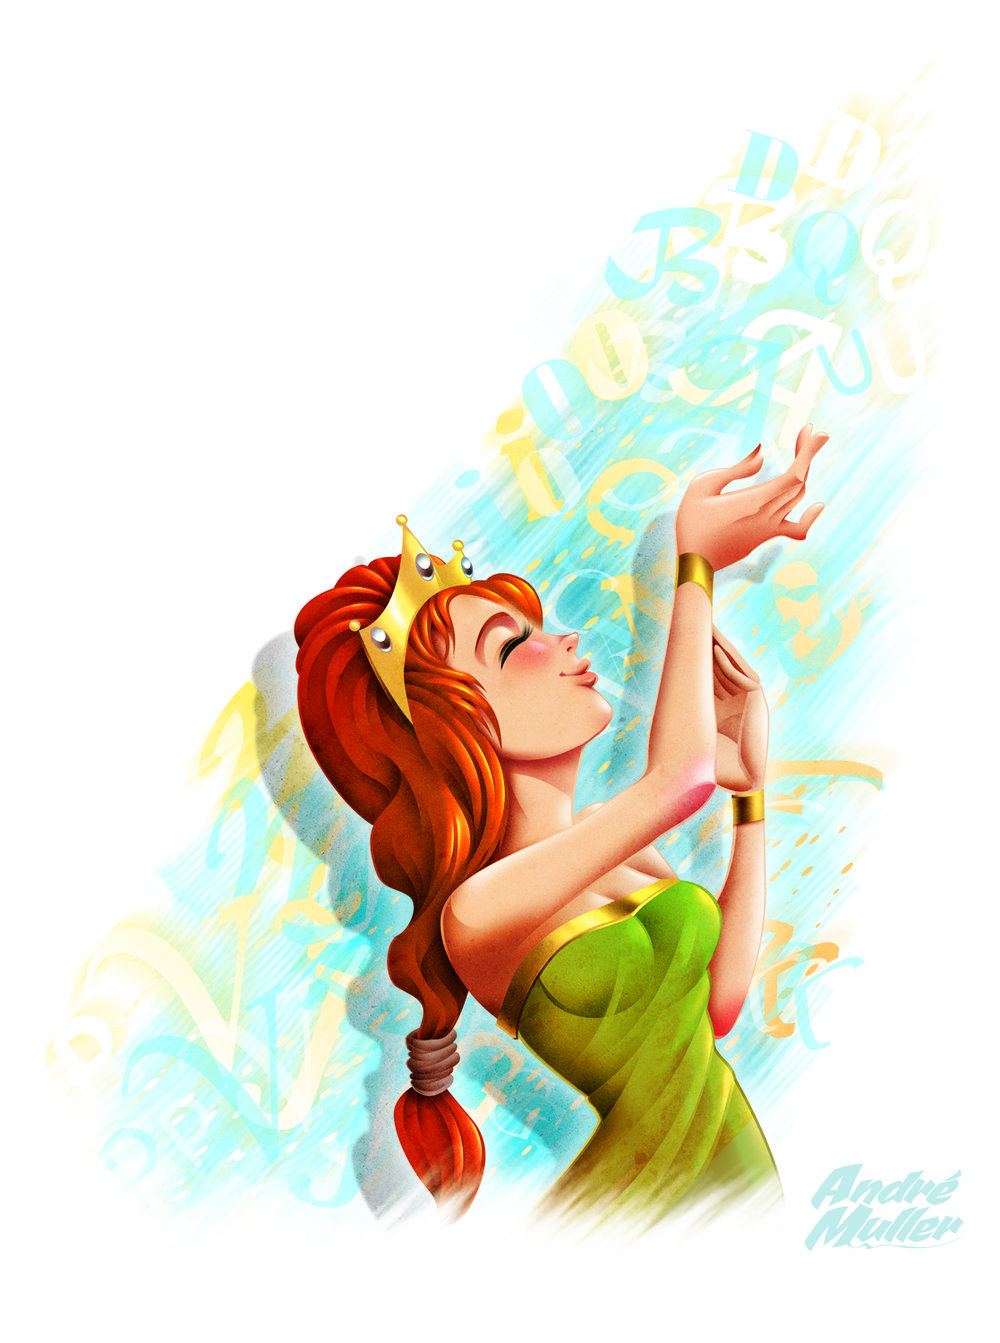 princesa1.jpg